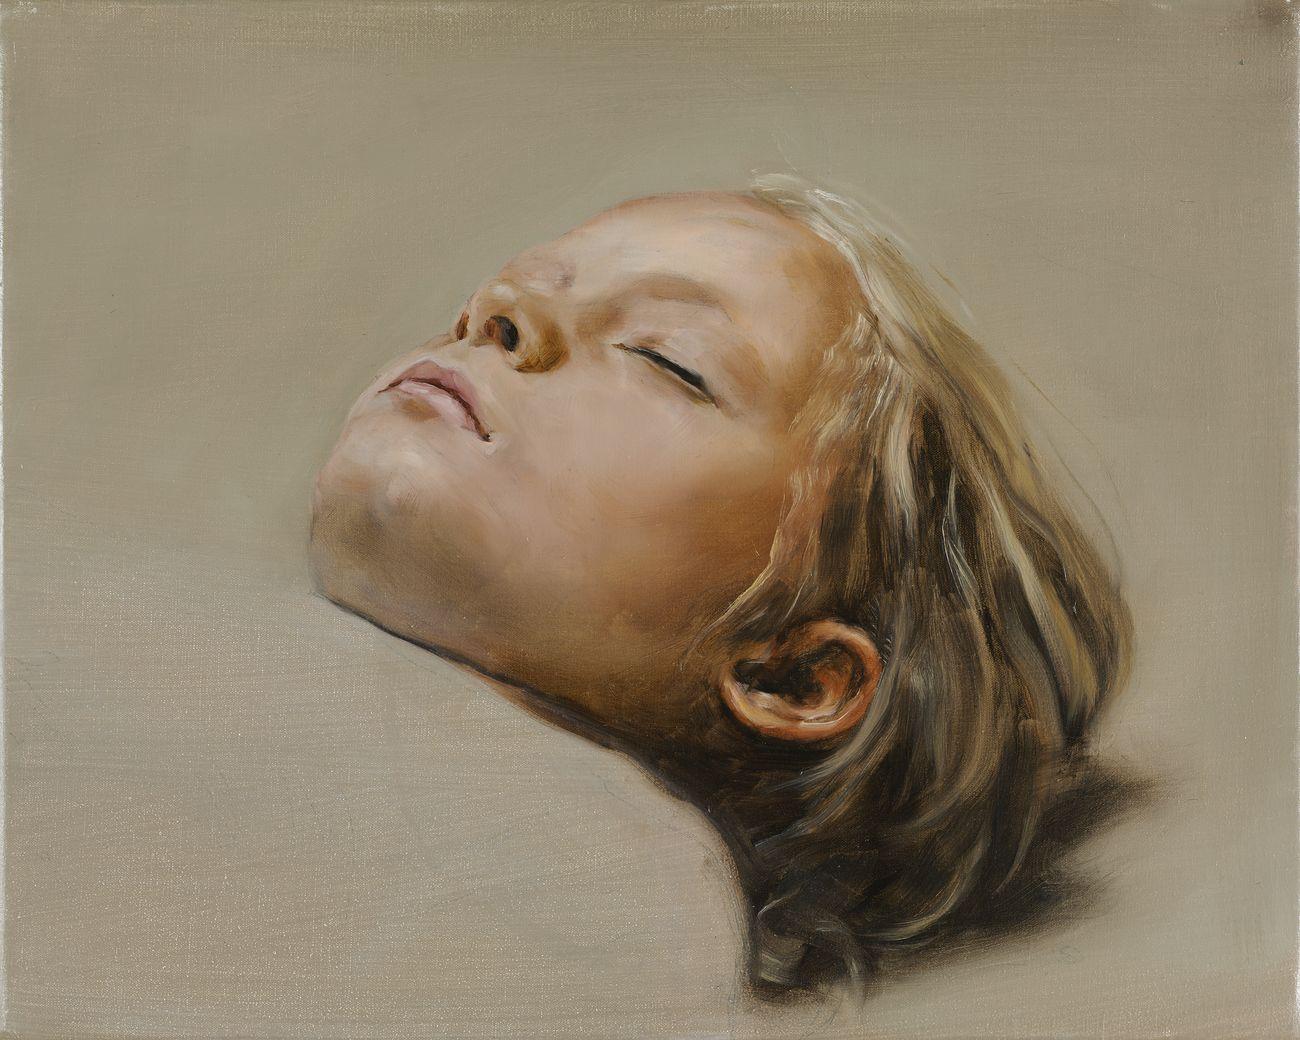 Michaël Borremans, Sleeper, 2007-08. Courtesy Zeno X Gallery, Anversa. Photo Peter Cox